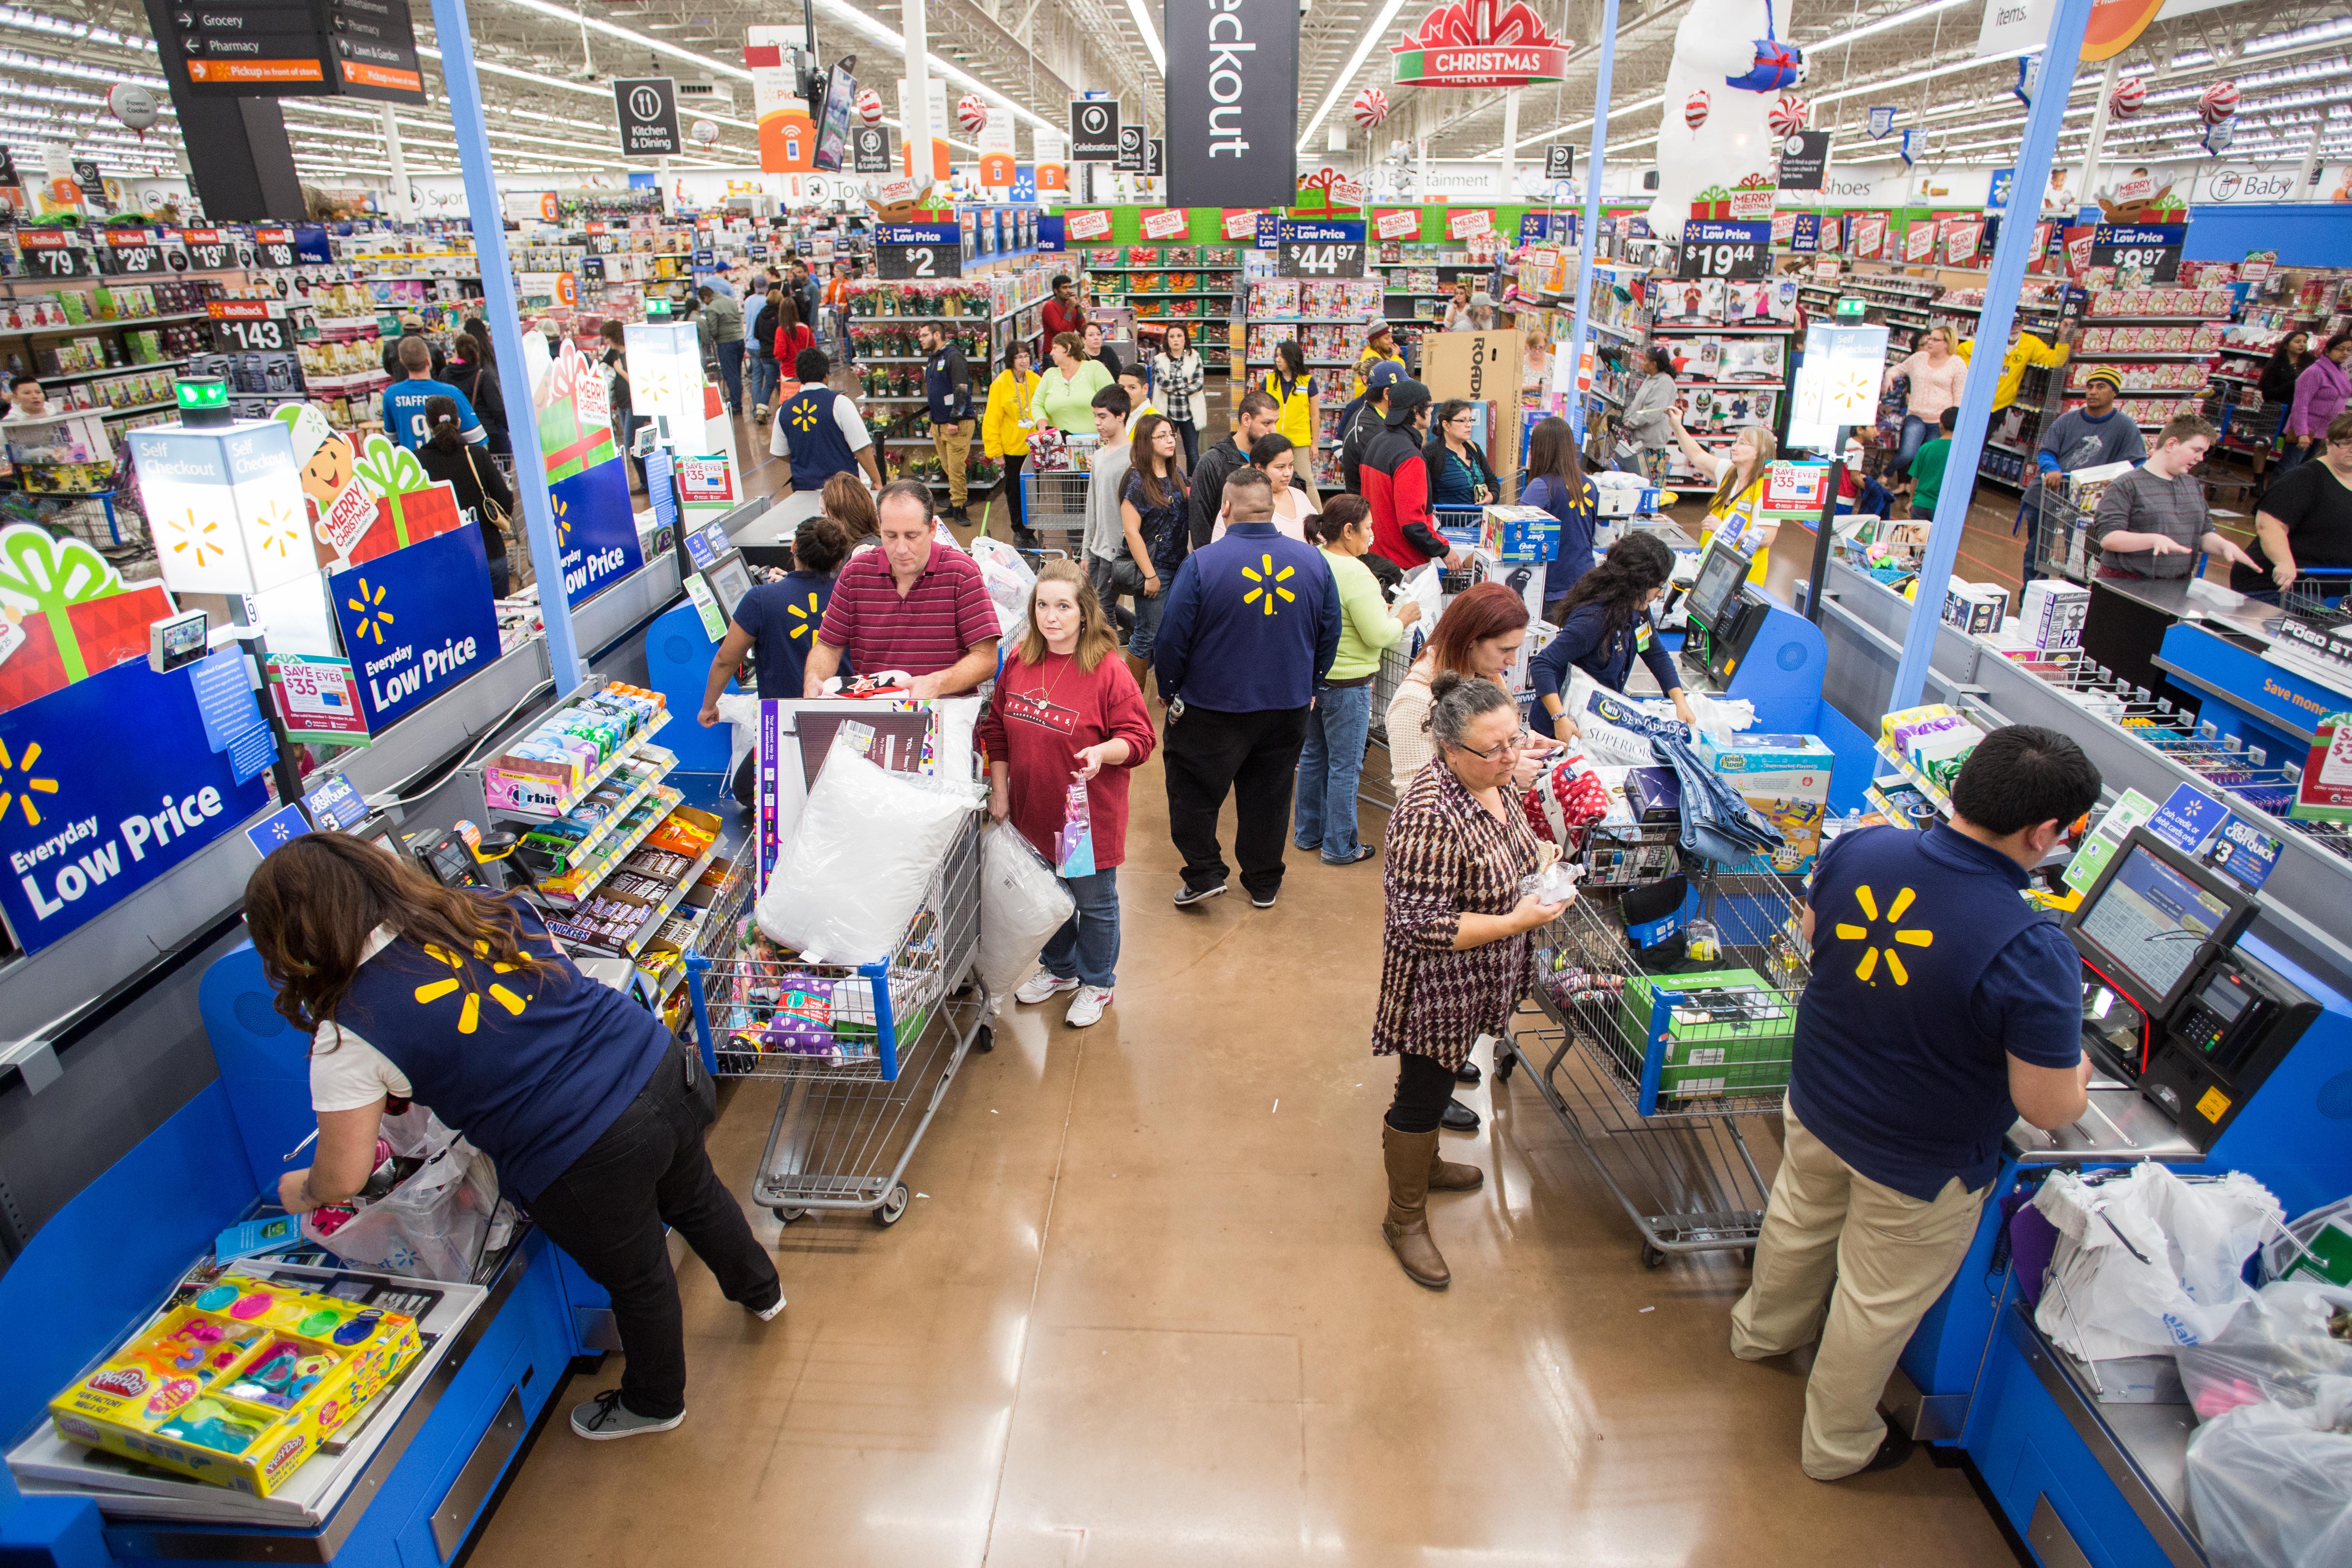 Is Walmart's E-Commerce Strategy Failing? | The Motley Fool